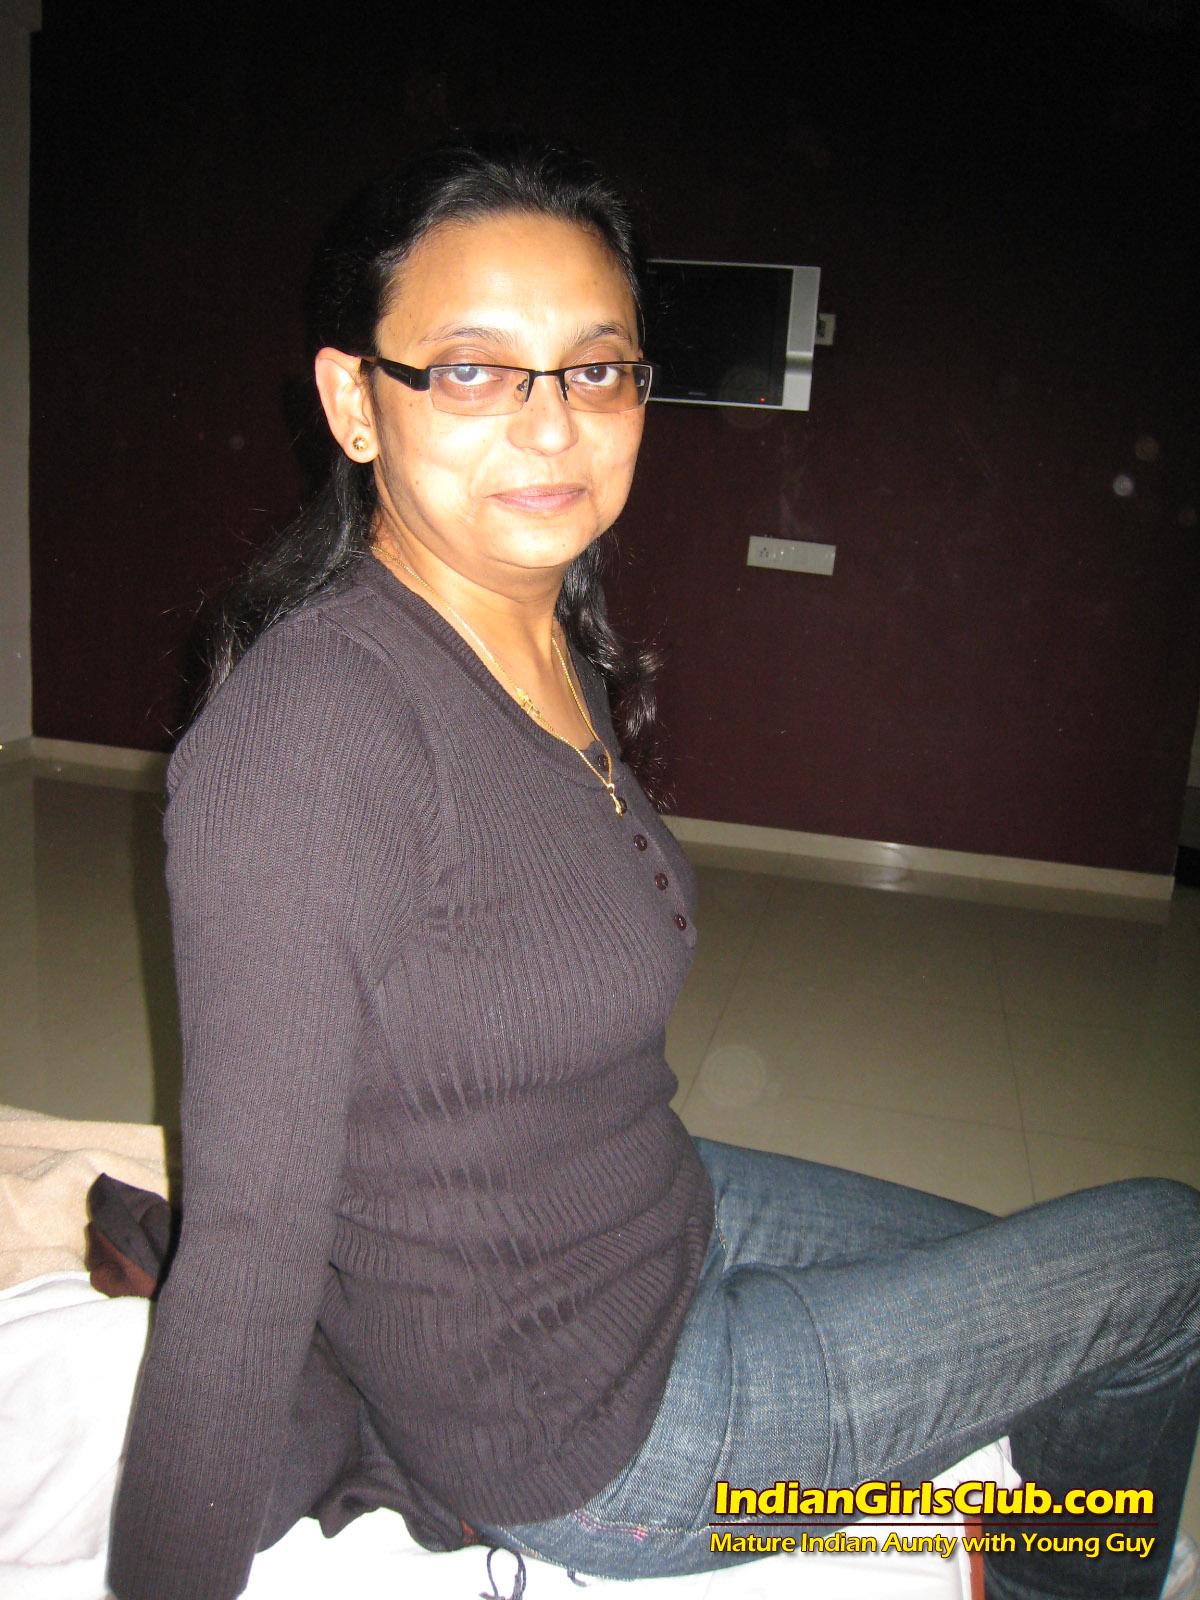 Indian girls club mature